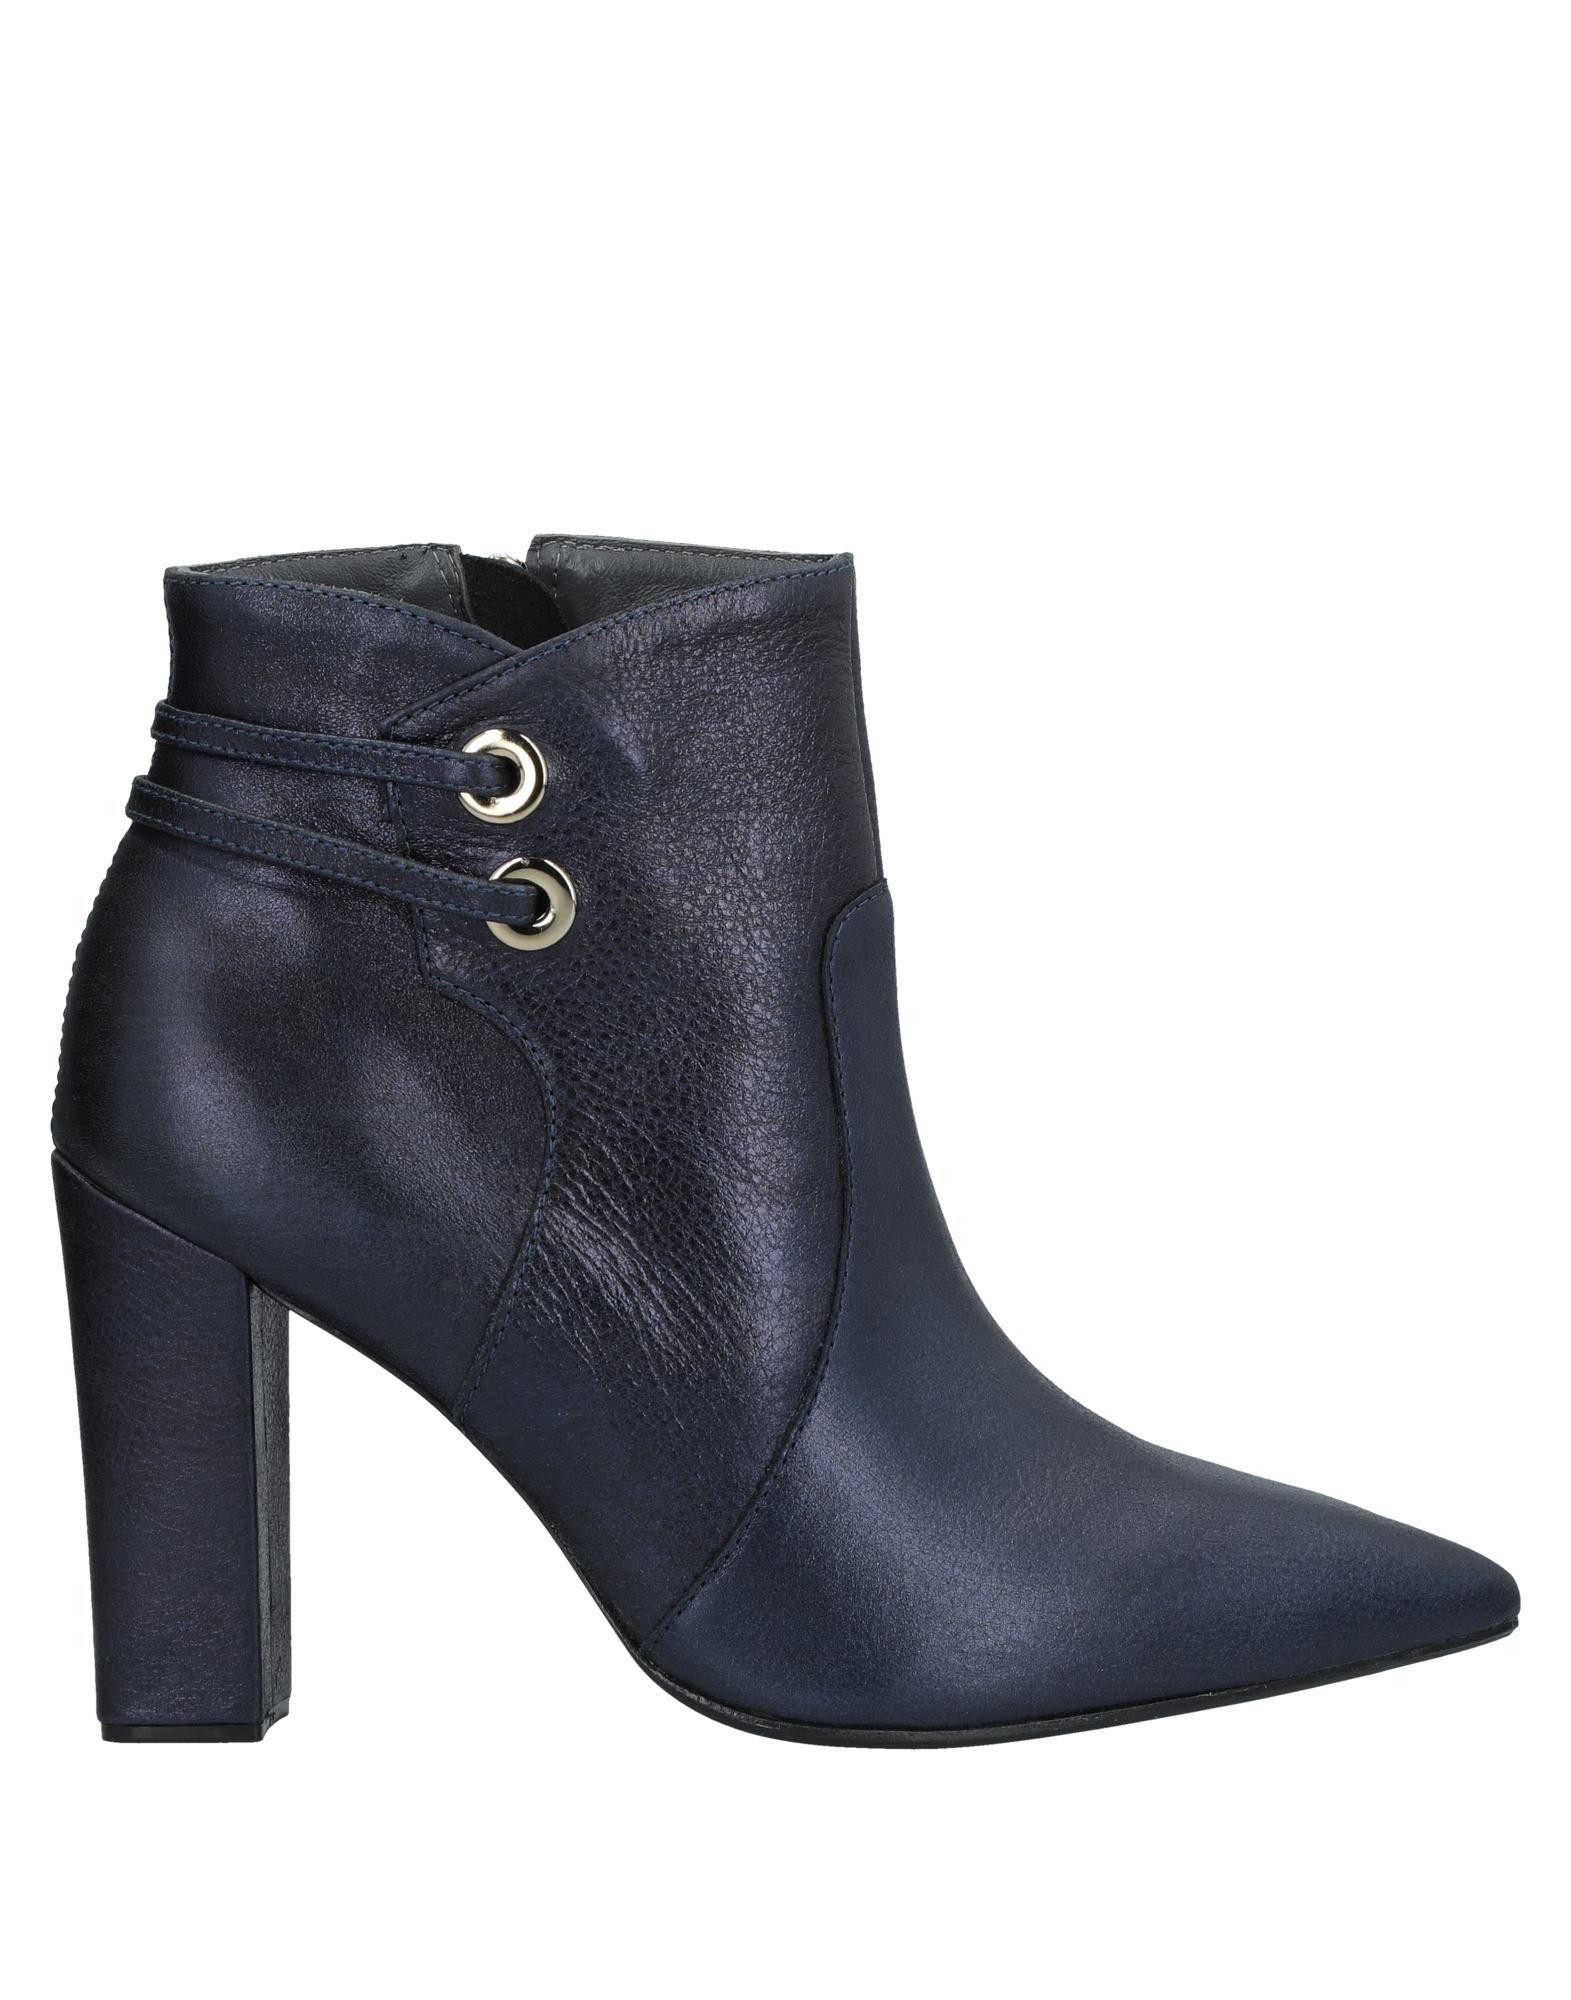 Gut um billige Damen Schuhe zu tragenPrimafila Stiefelette Damen billige  11504562LA b88f7c